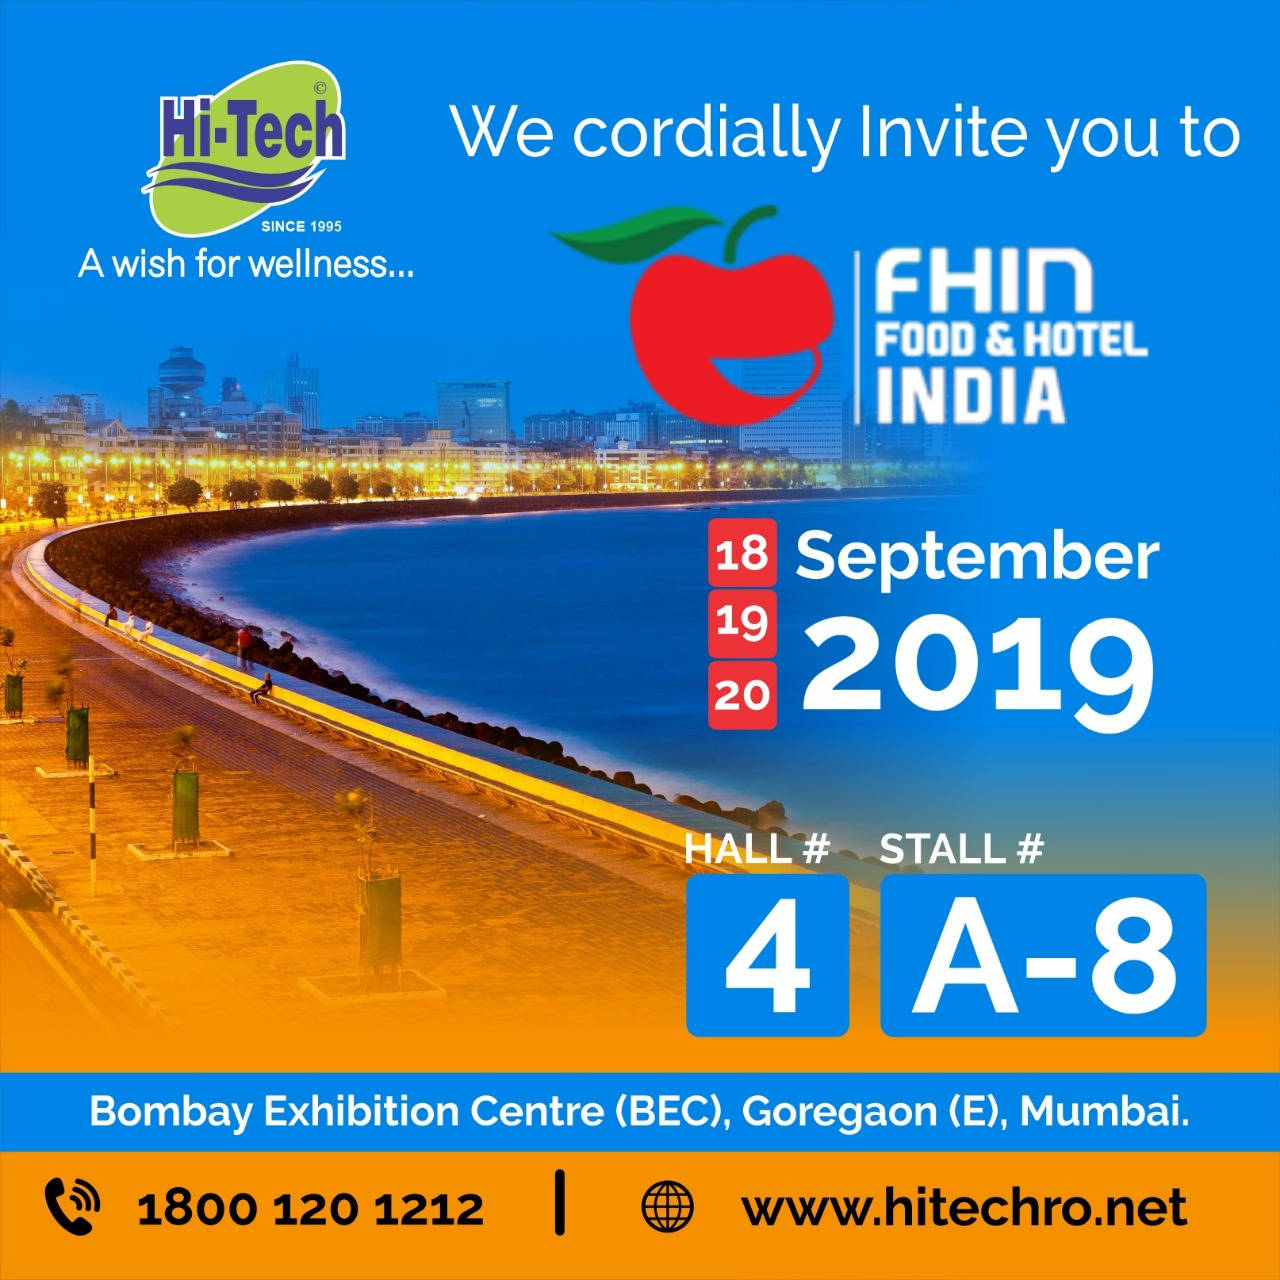 Food & Hotel India Expo 2019